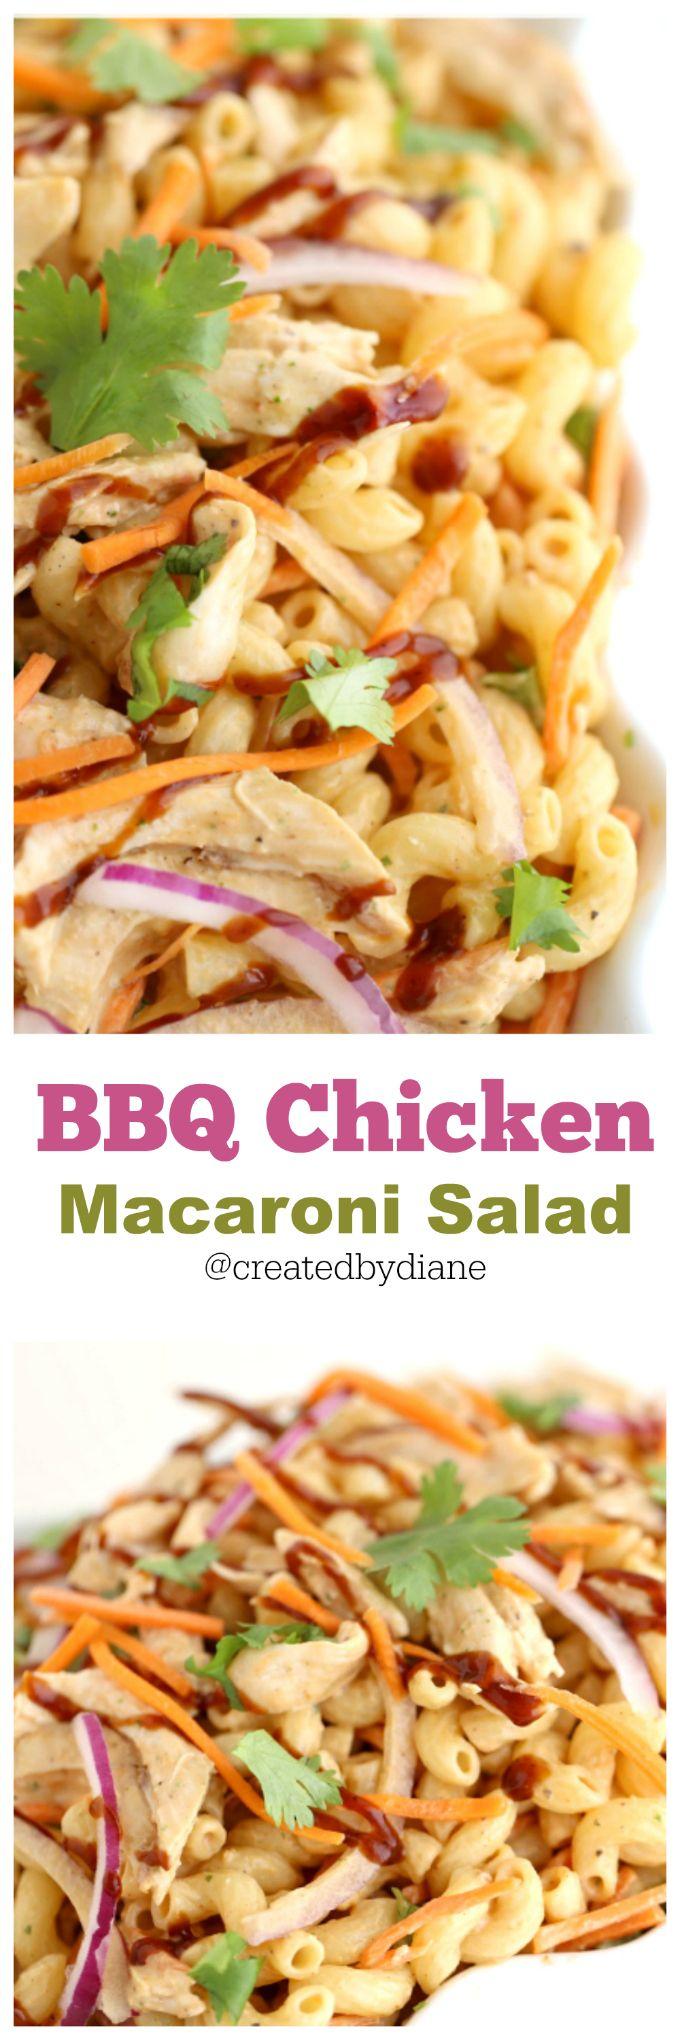 BBQ Chicken Macaroni Salad